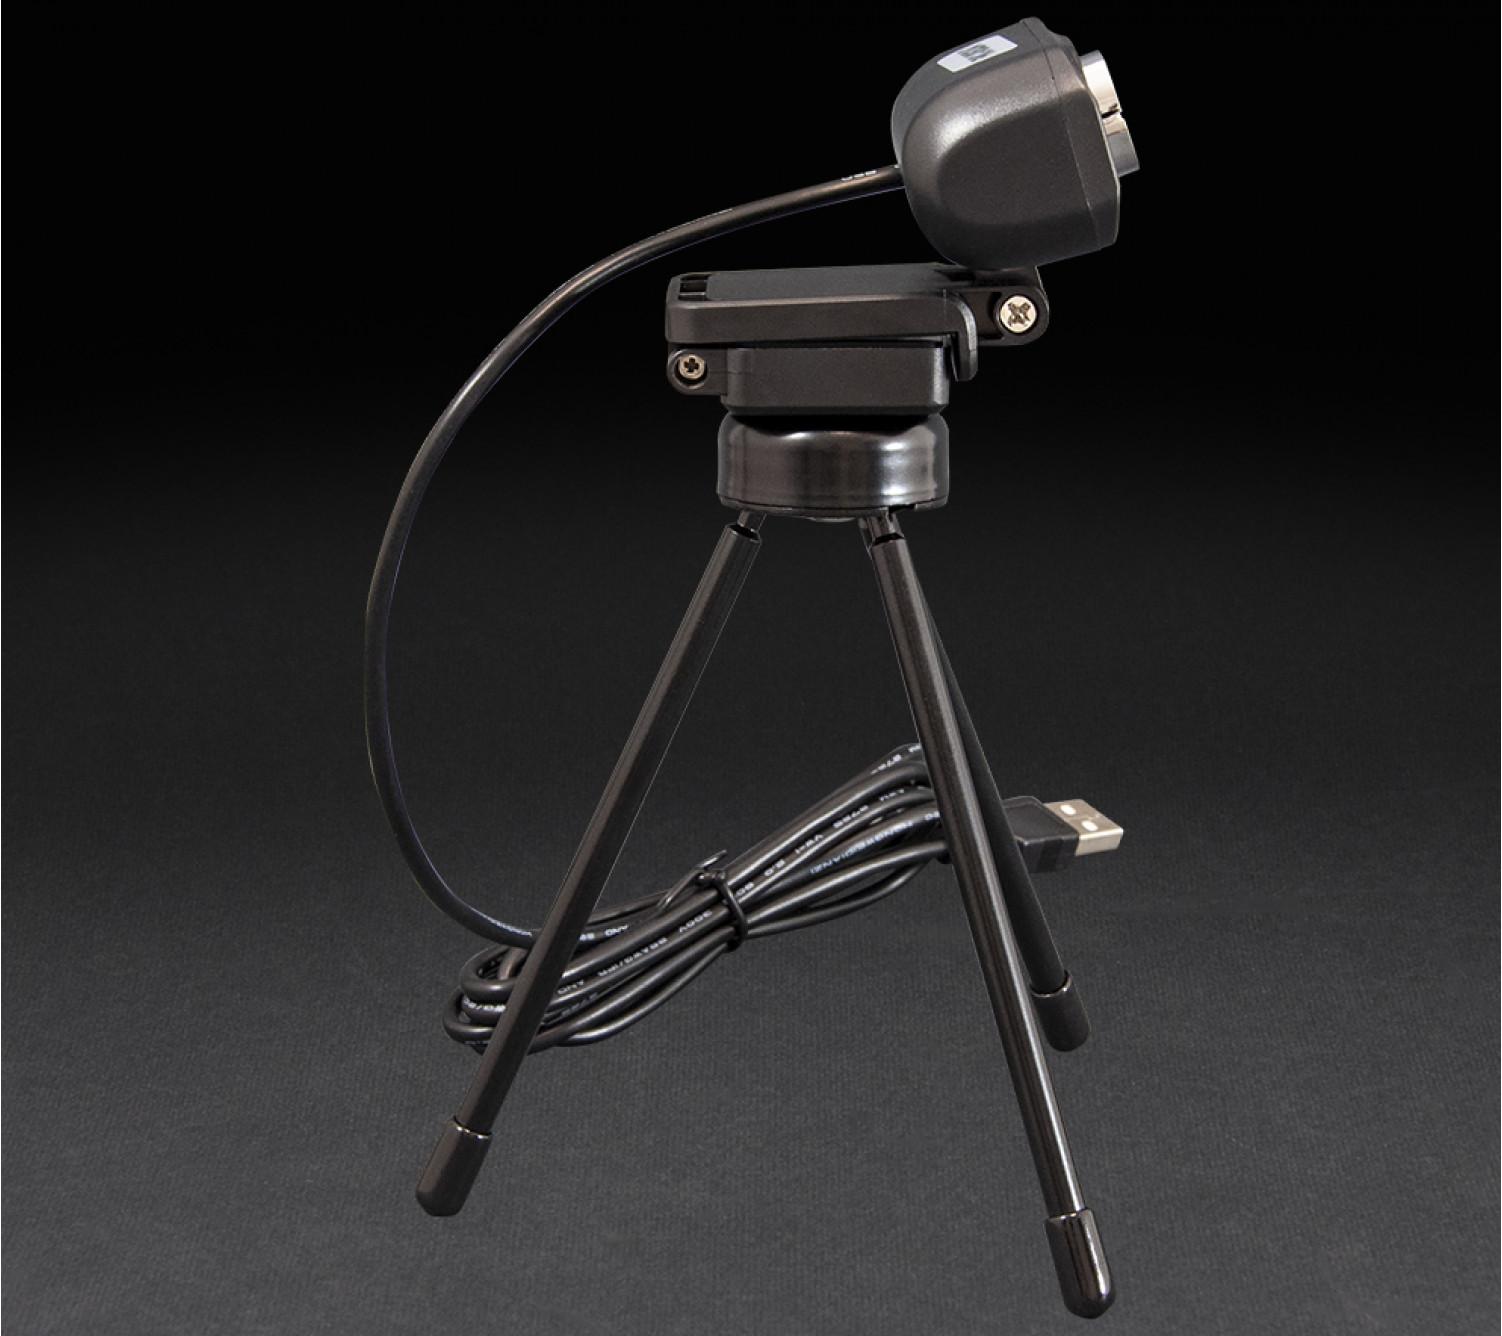 Веб-камера з триподом Frime FWC-006 FHD